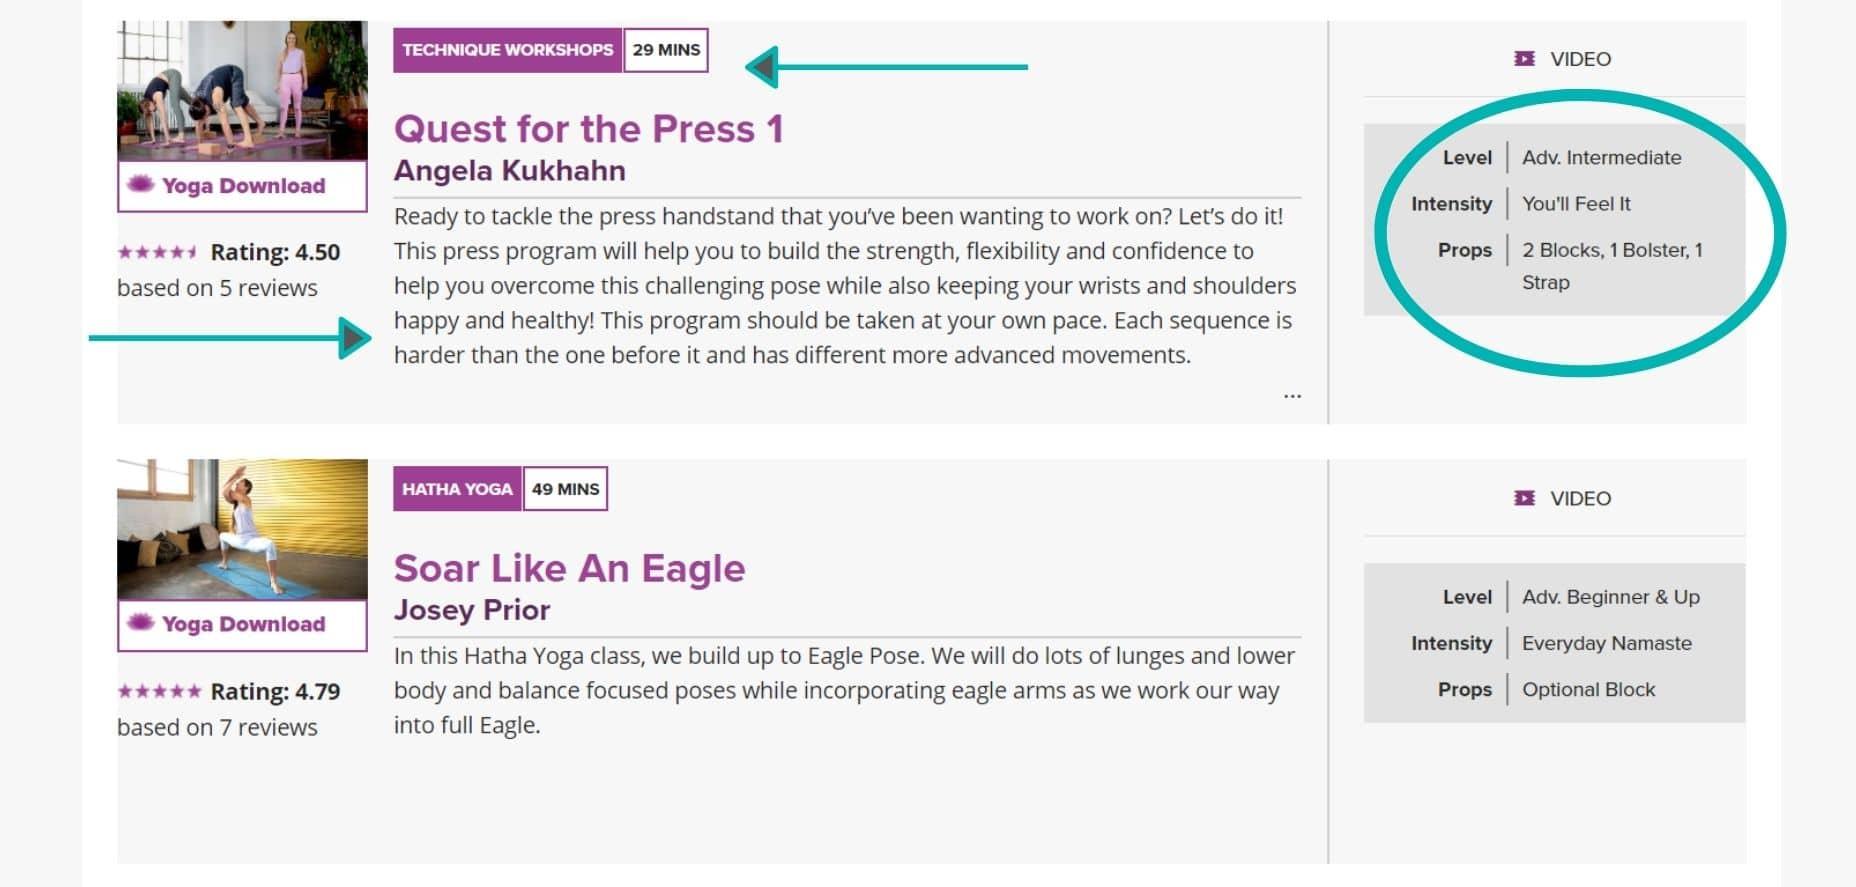 Woman teaching advanced online yoga classes on YogaDownload online yoga website.